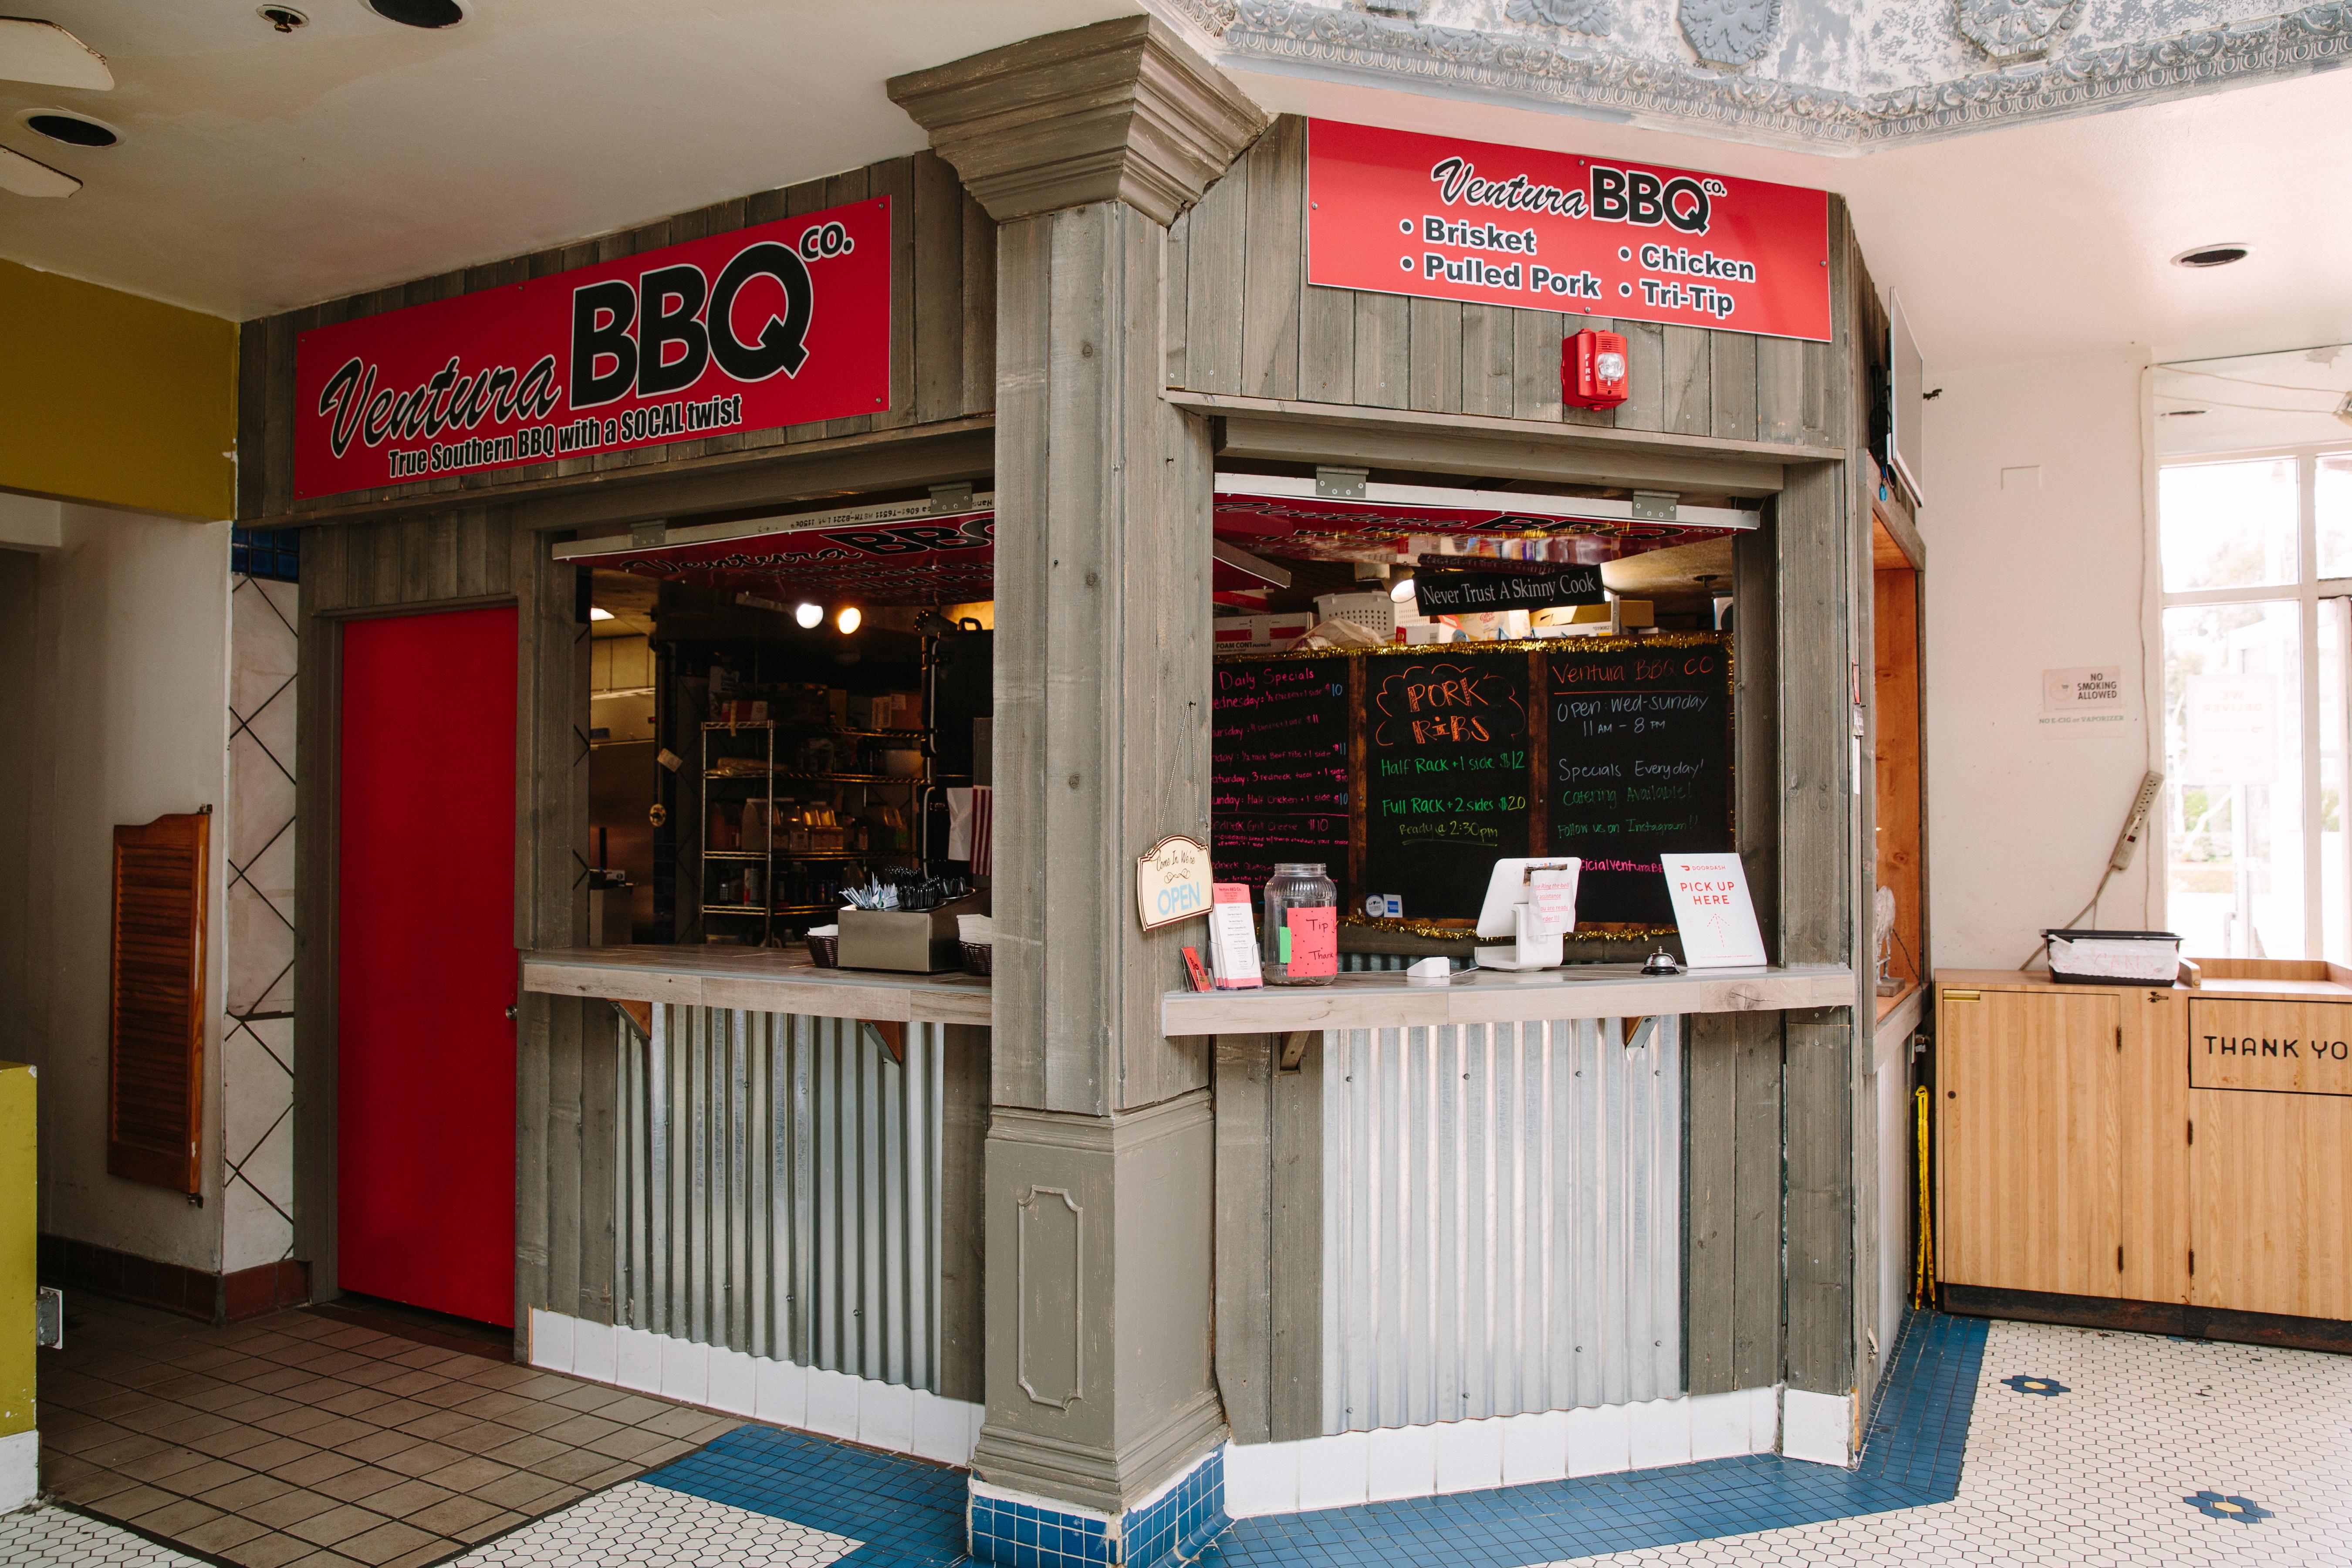 Ventura BBQ Company